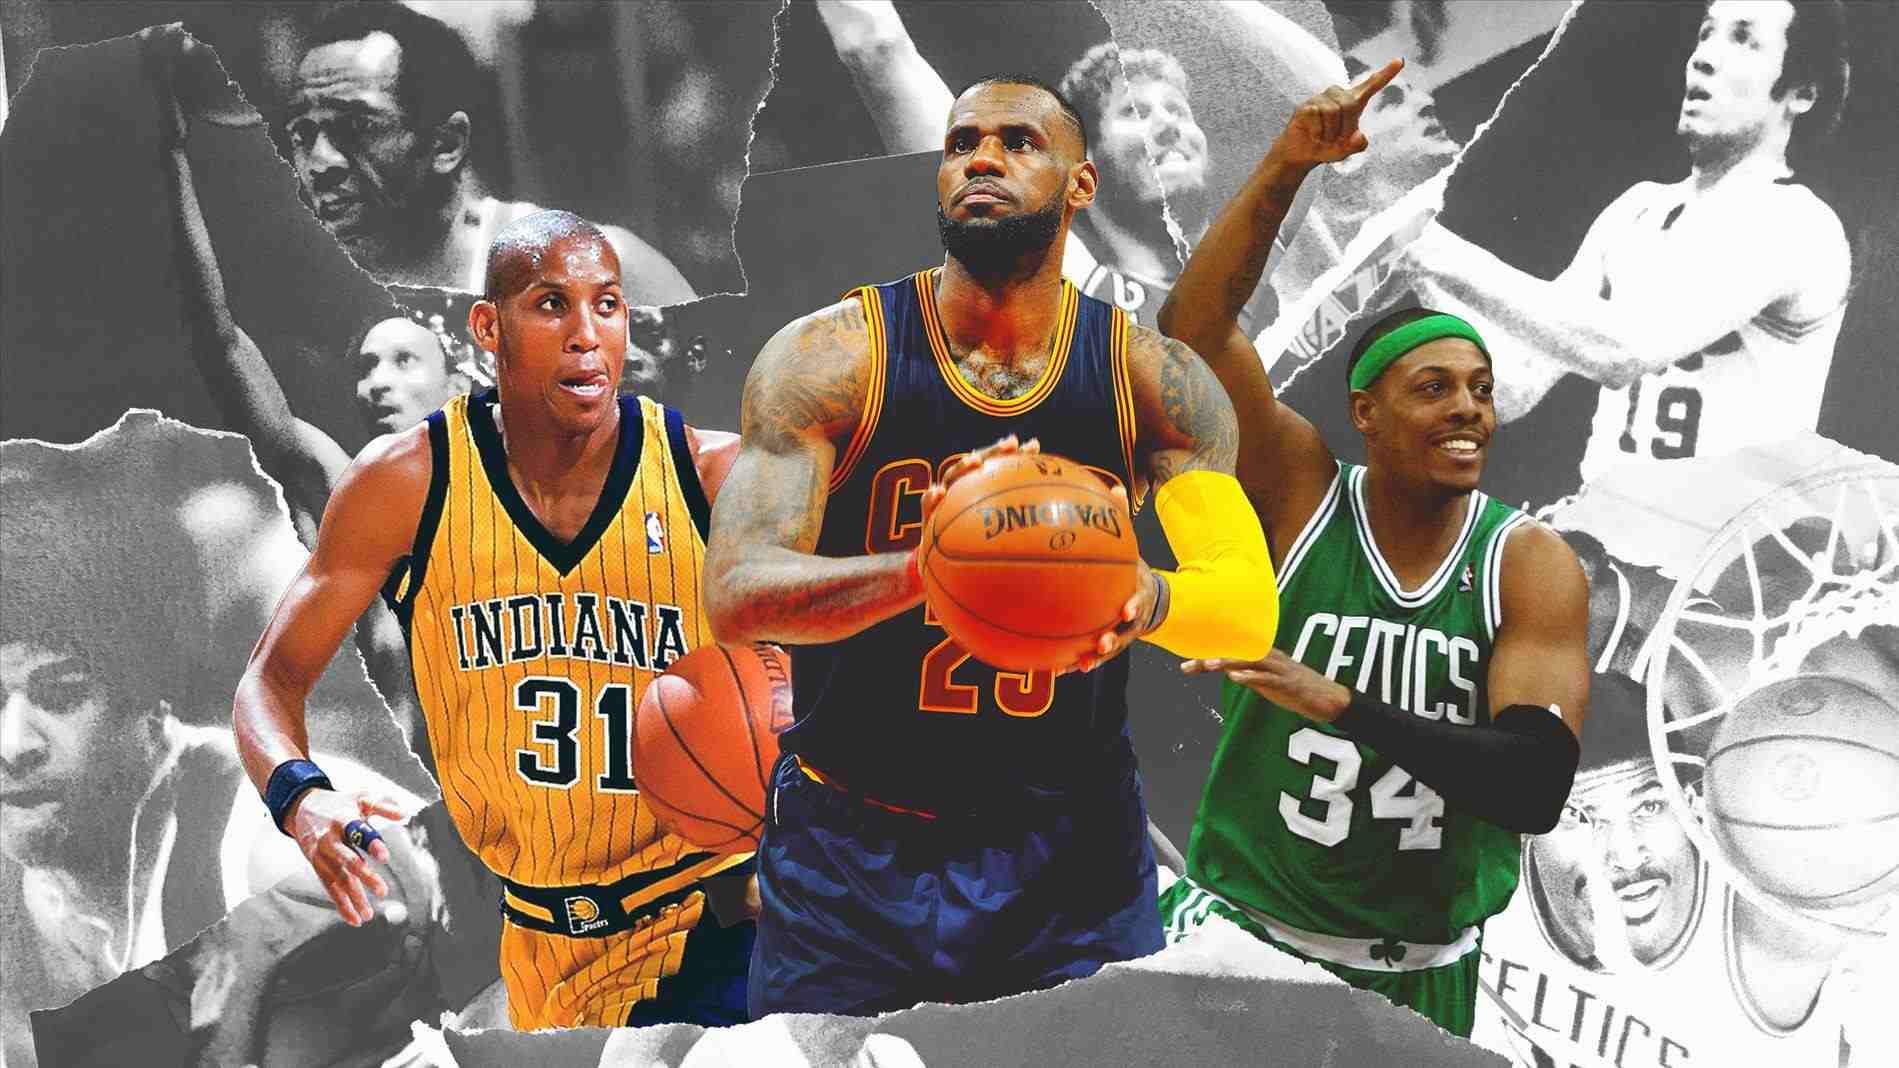 Nba Legends Wallpaper: Top Free NBA Legends Backgrounds